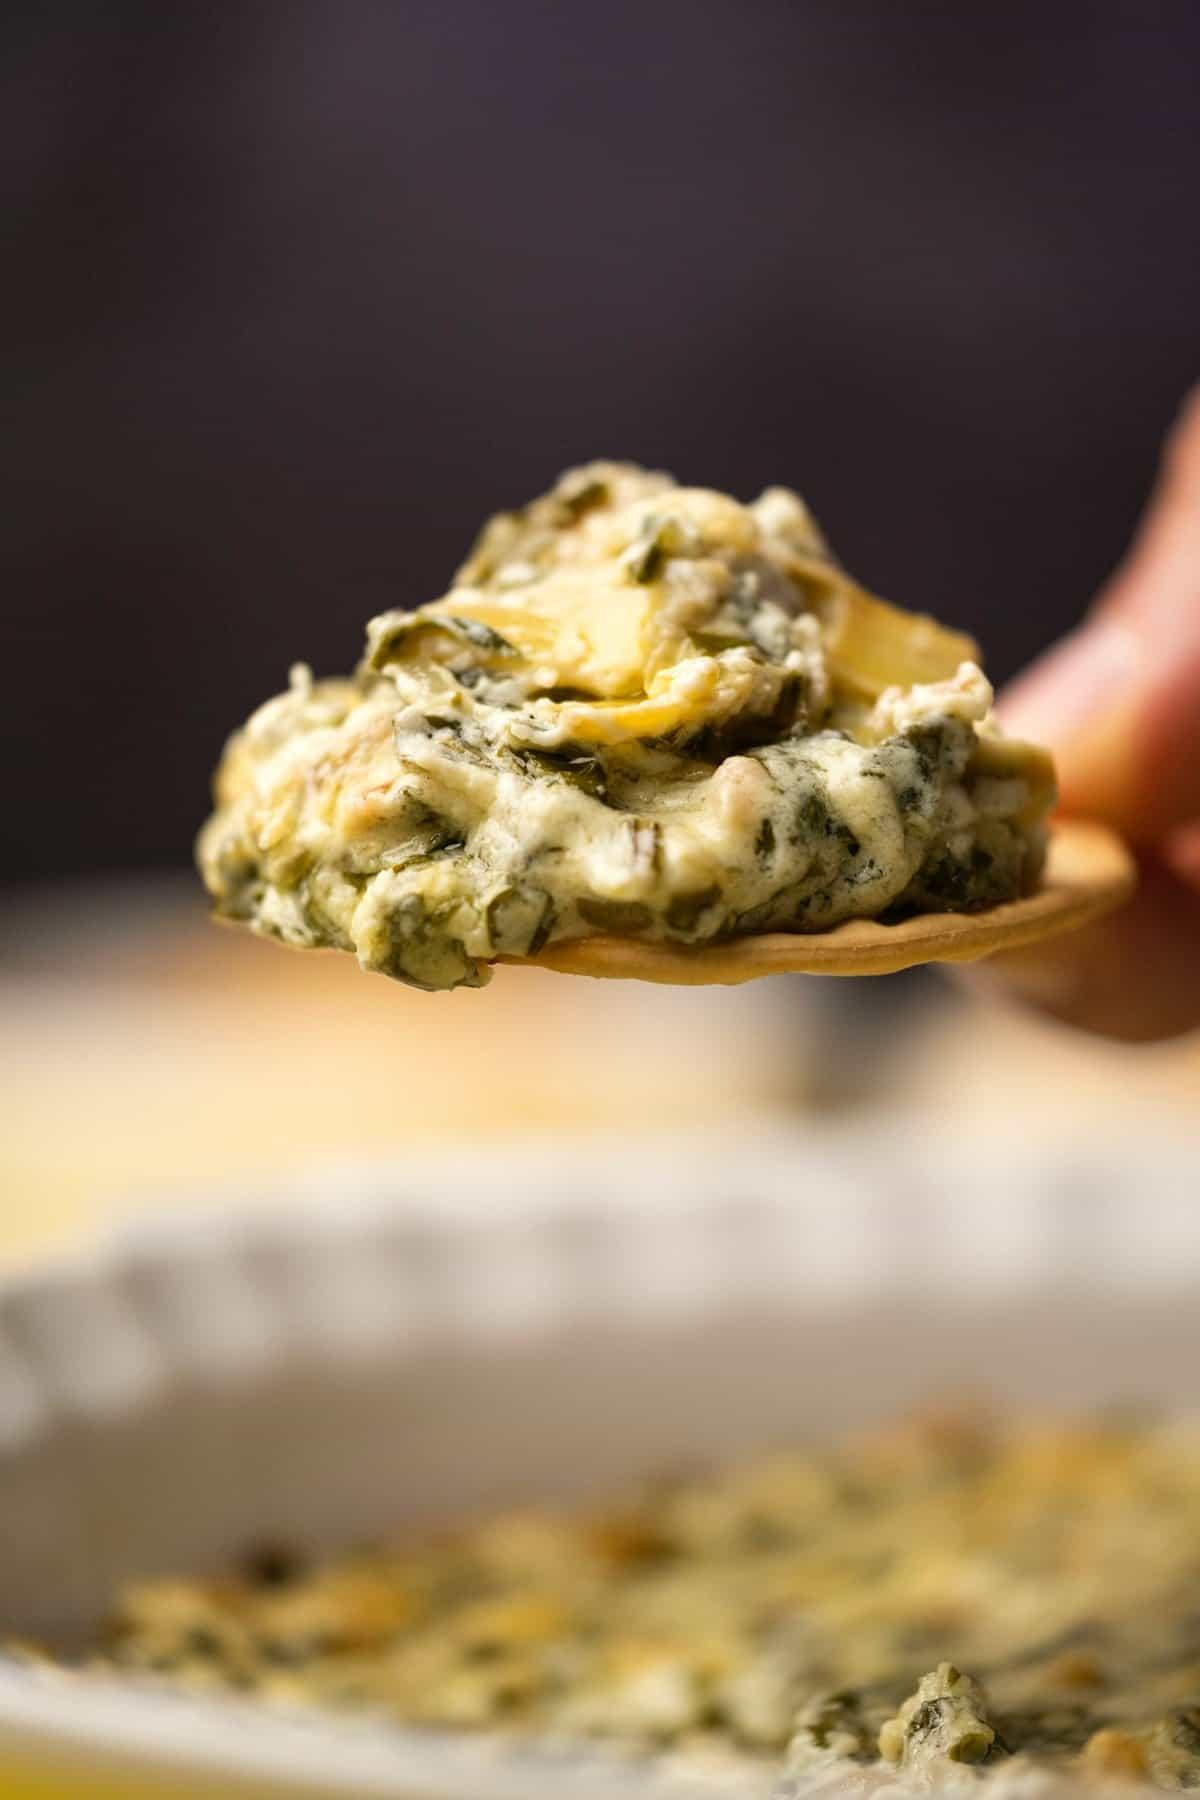 Spinach artichoke dip on a cracker.